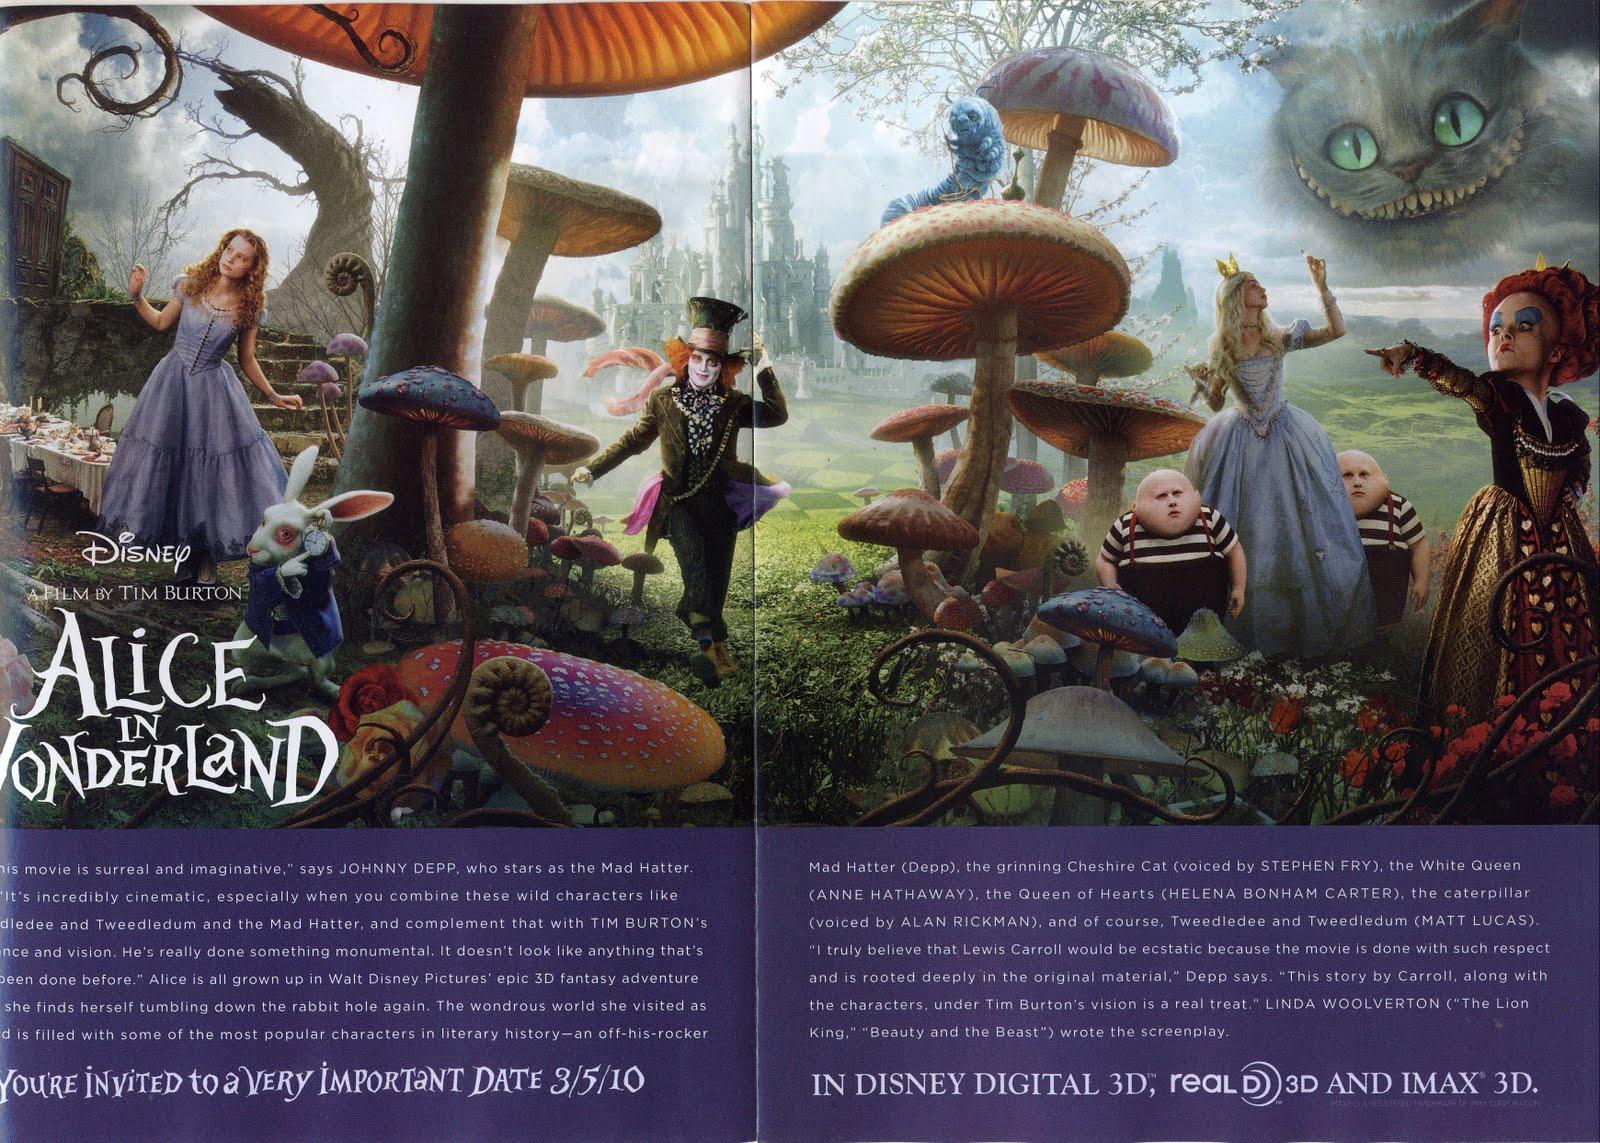 http://3.bp.blogspot.com/_wg3BmAj-bsI/SvdZLScQPHI/AAAAAAAAMTE/GBJPecpMu_c/s1600/Alice_in_Wonderland_by_Nate_Lestrange.jpg